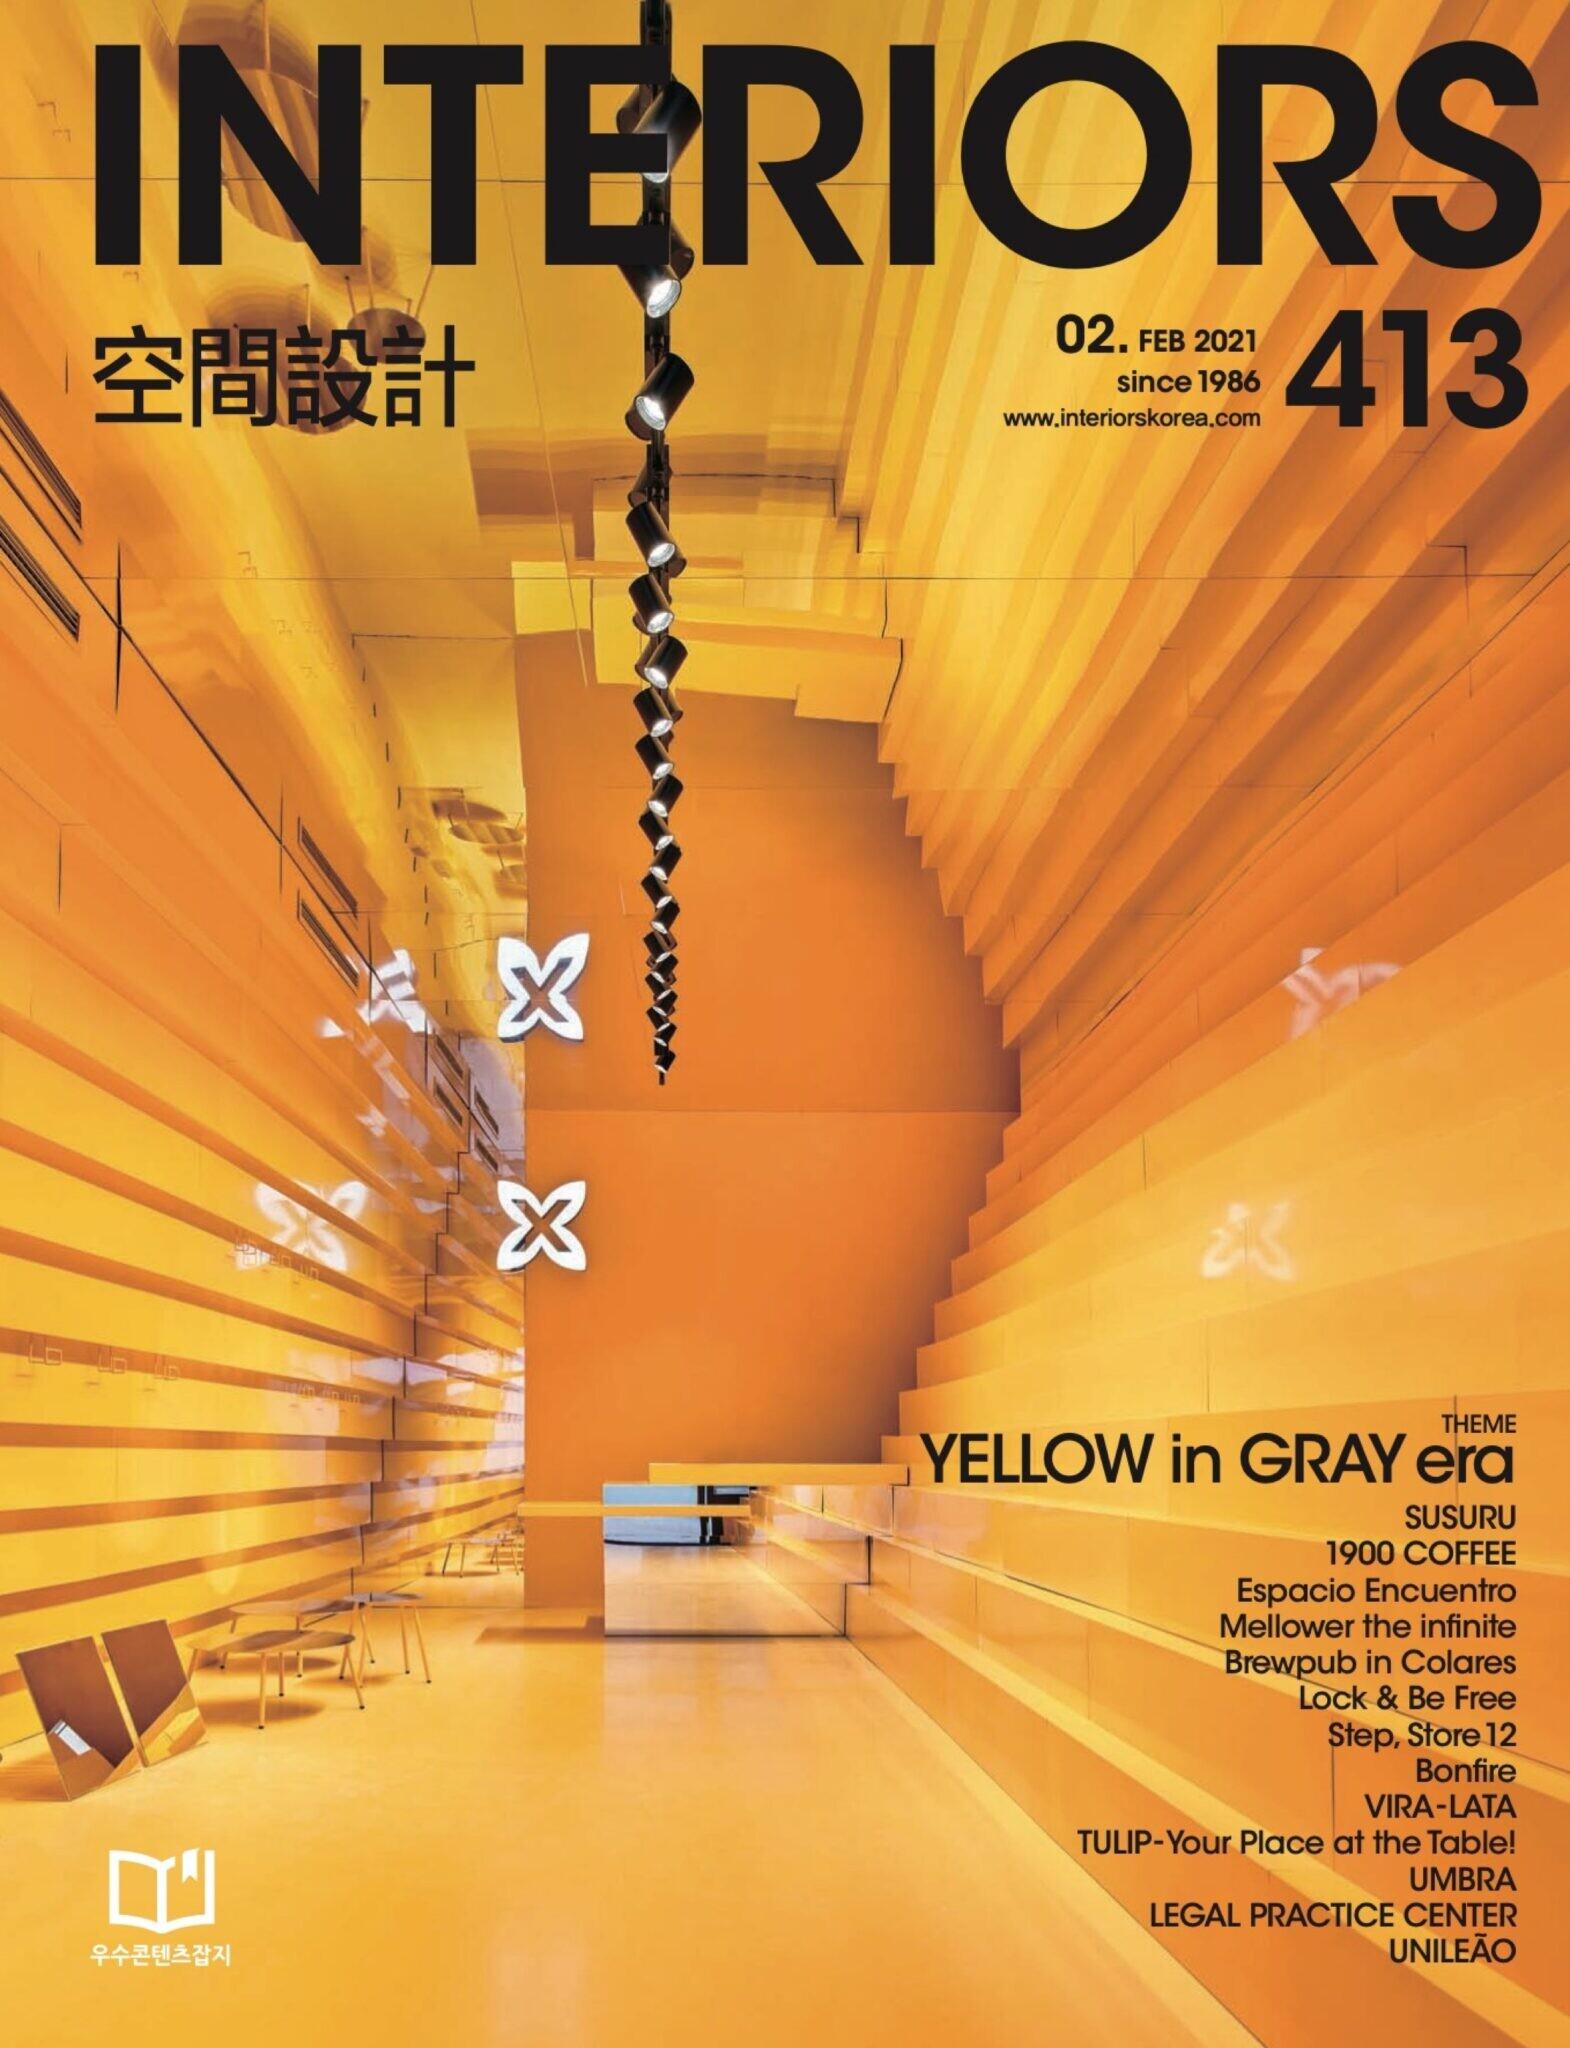 interiors-korea-studere-aramazens-morinha-15-1570×2048